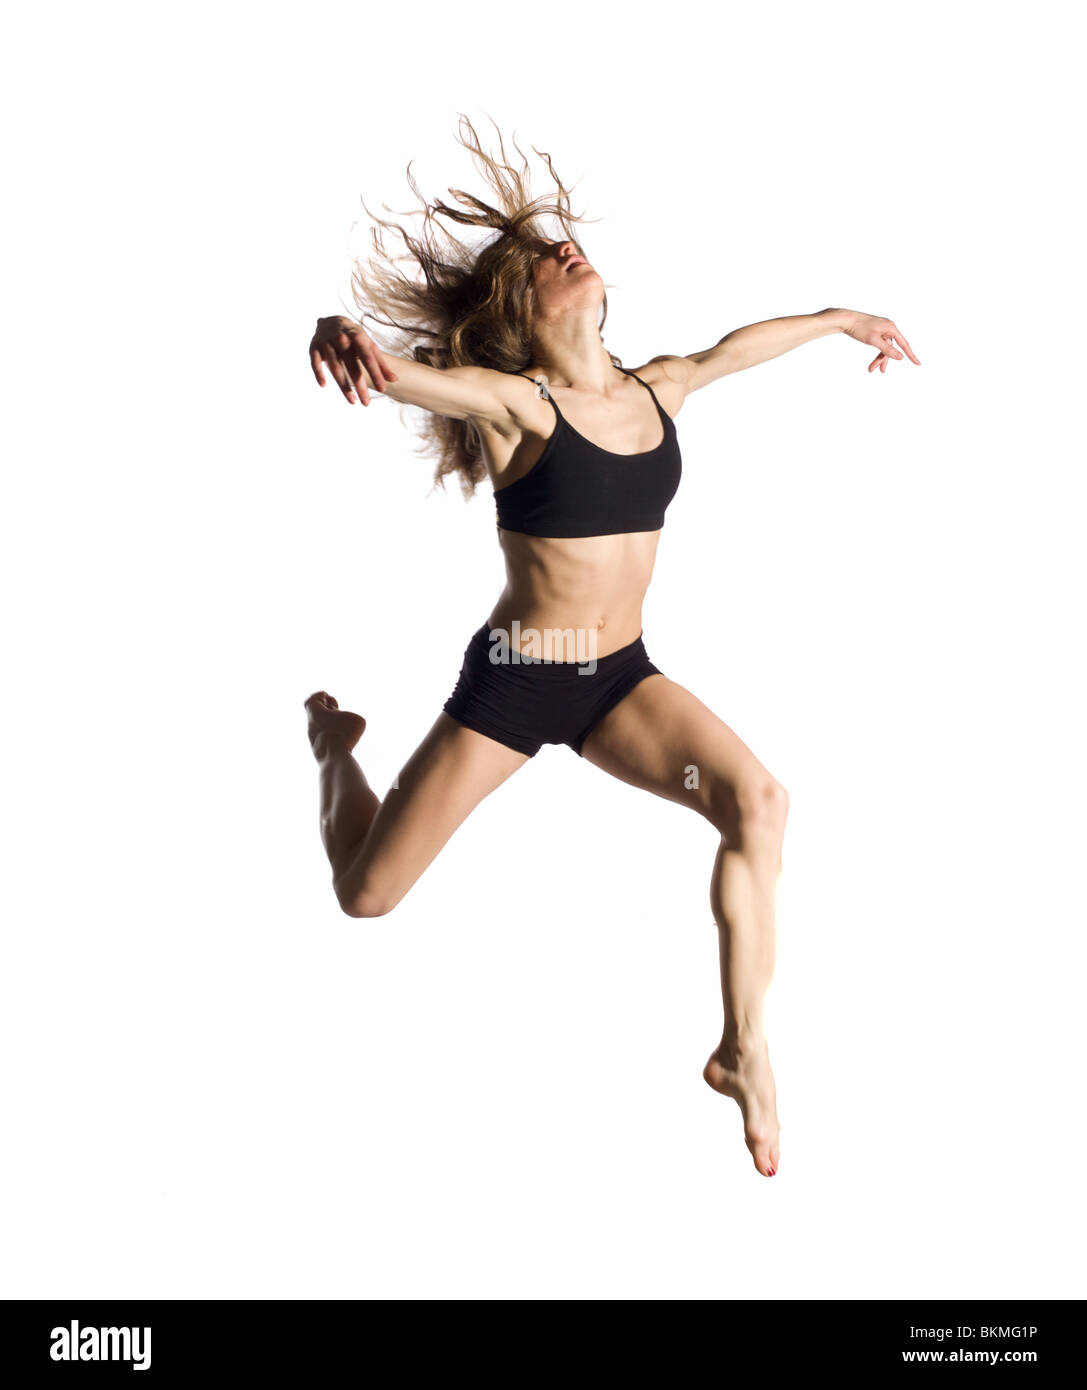 Bellissima giovane ballerina professionista jumping Immagini Stock